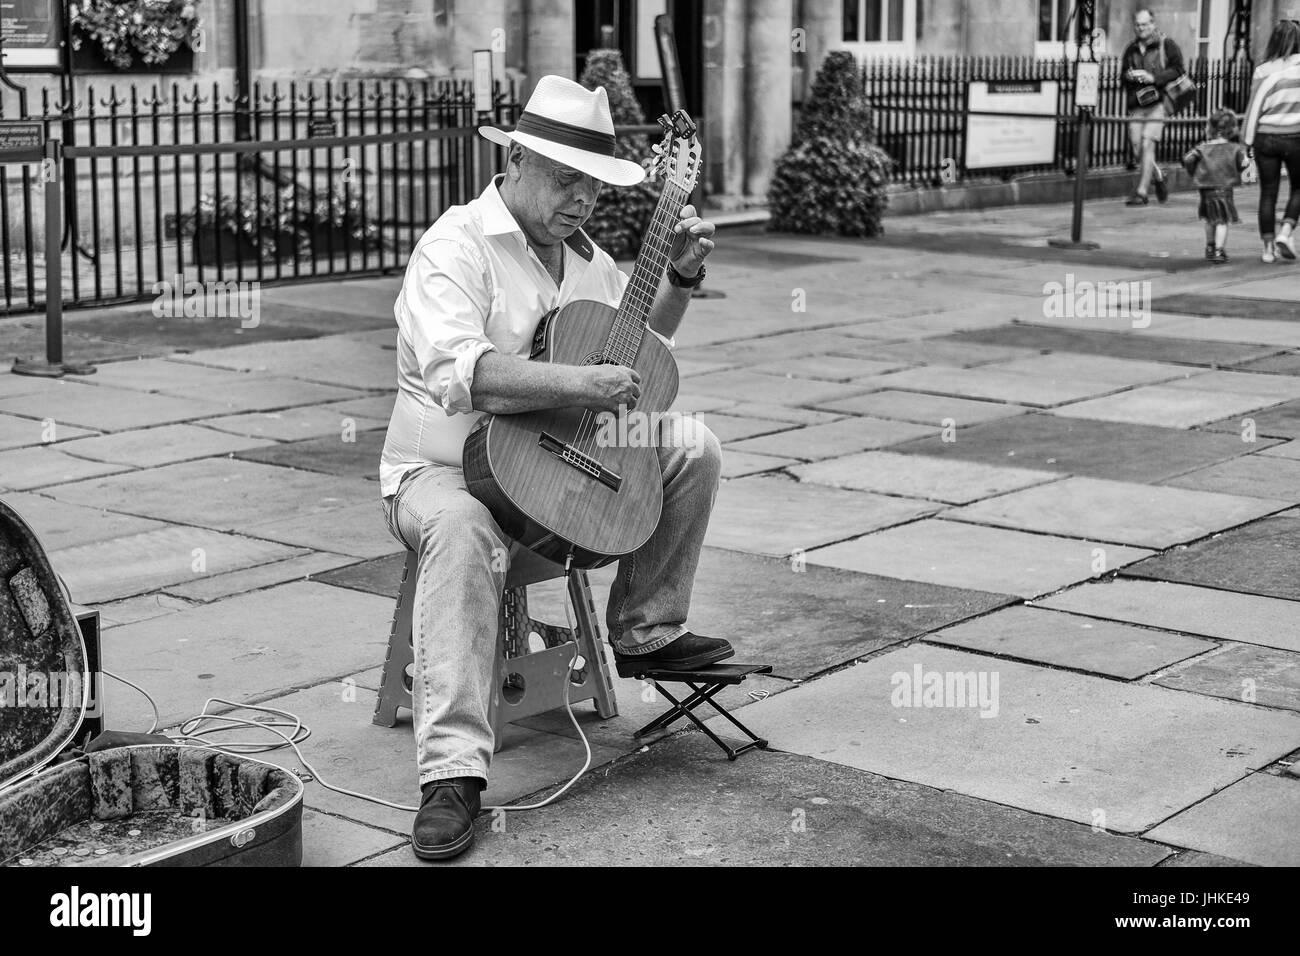 Street Photography Bath UK - Stock Image